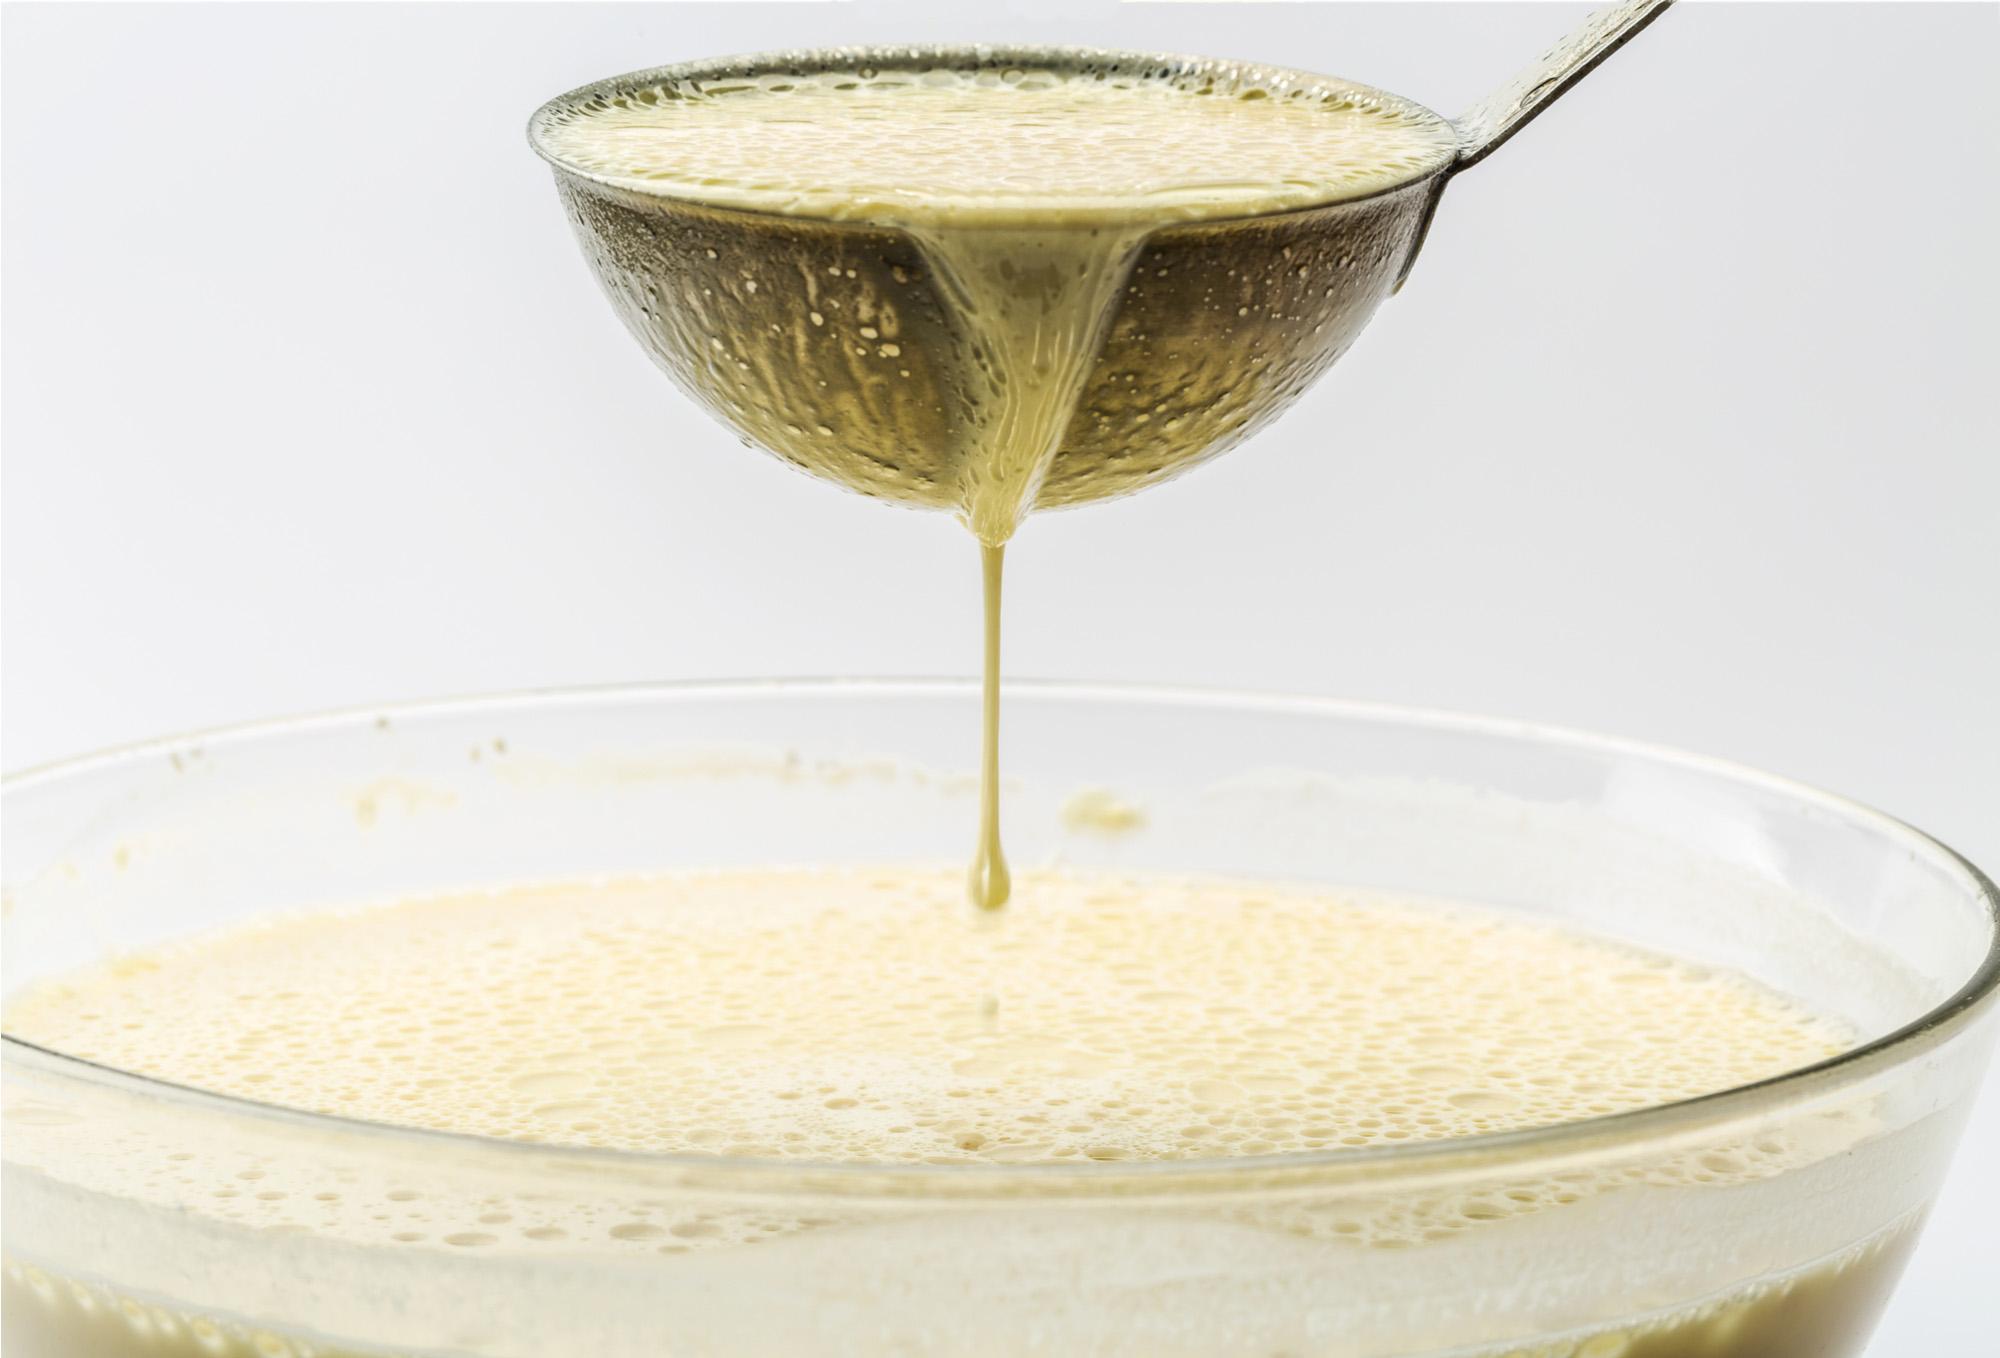 Liquid mix for pancakes-72 ppi